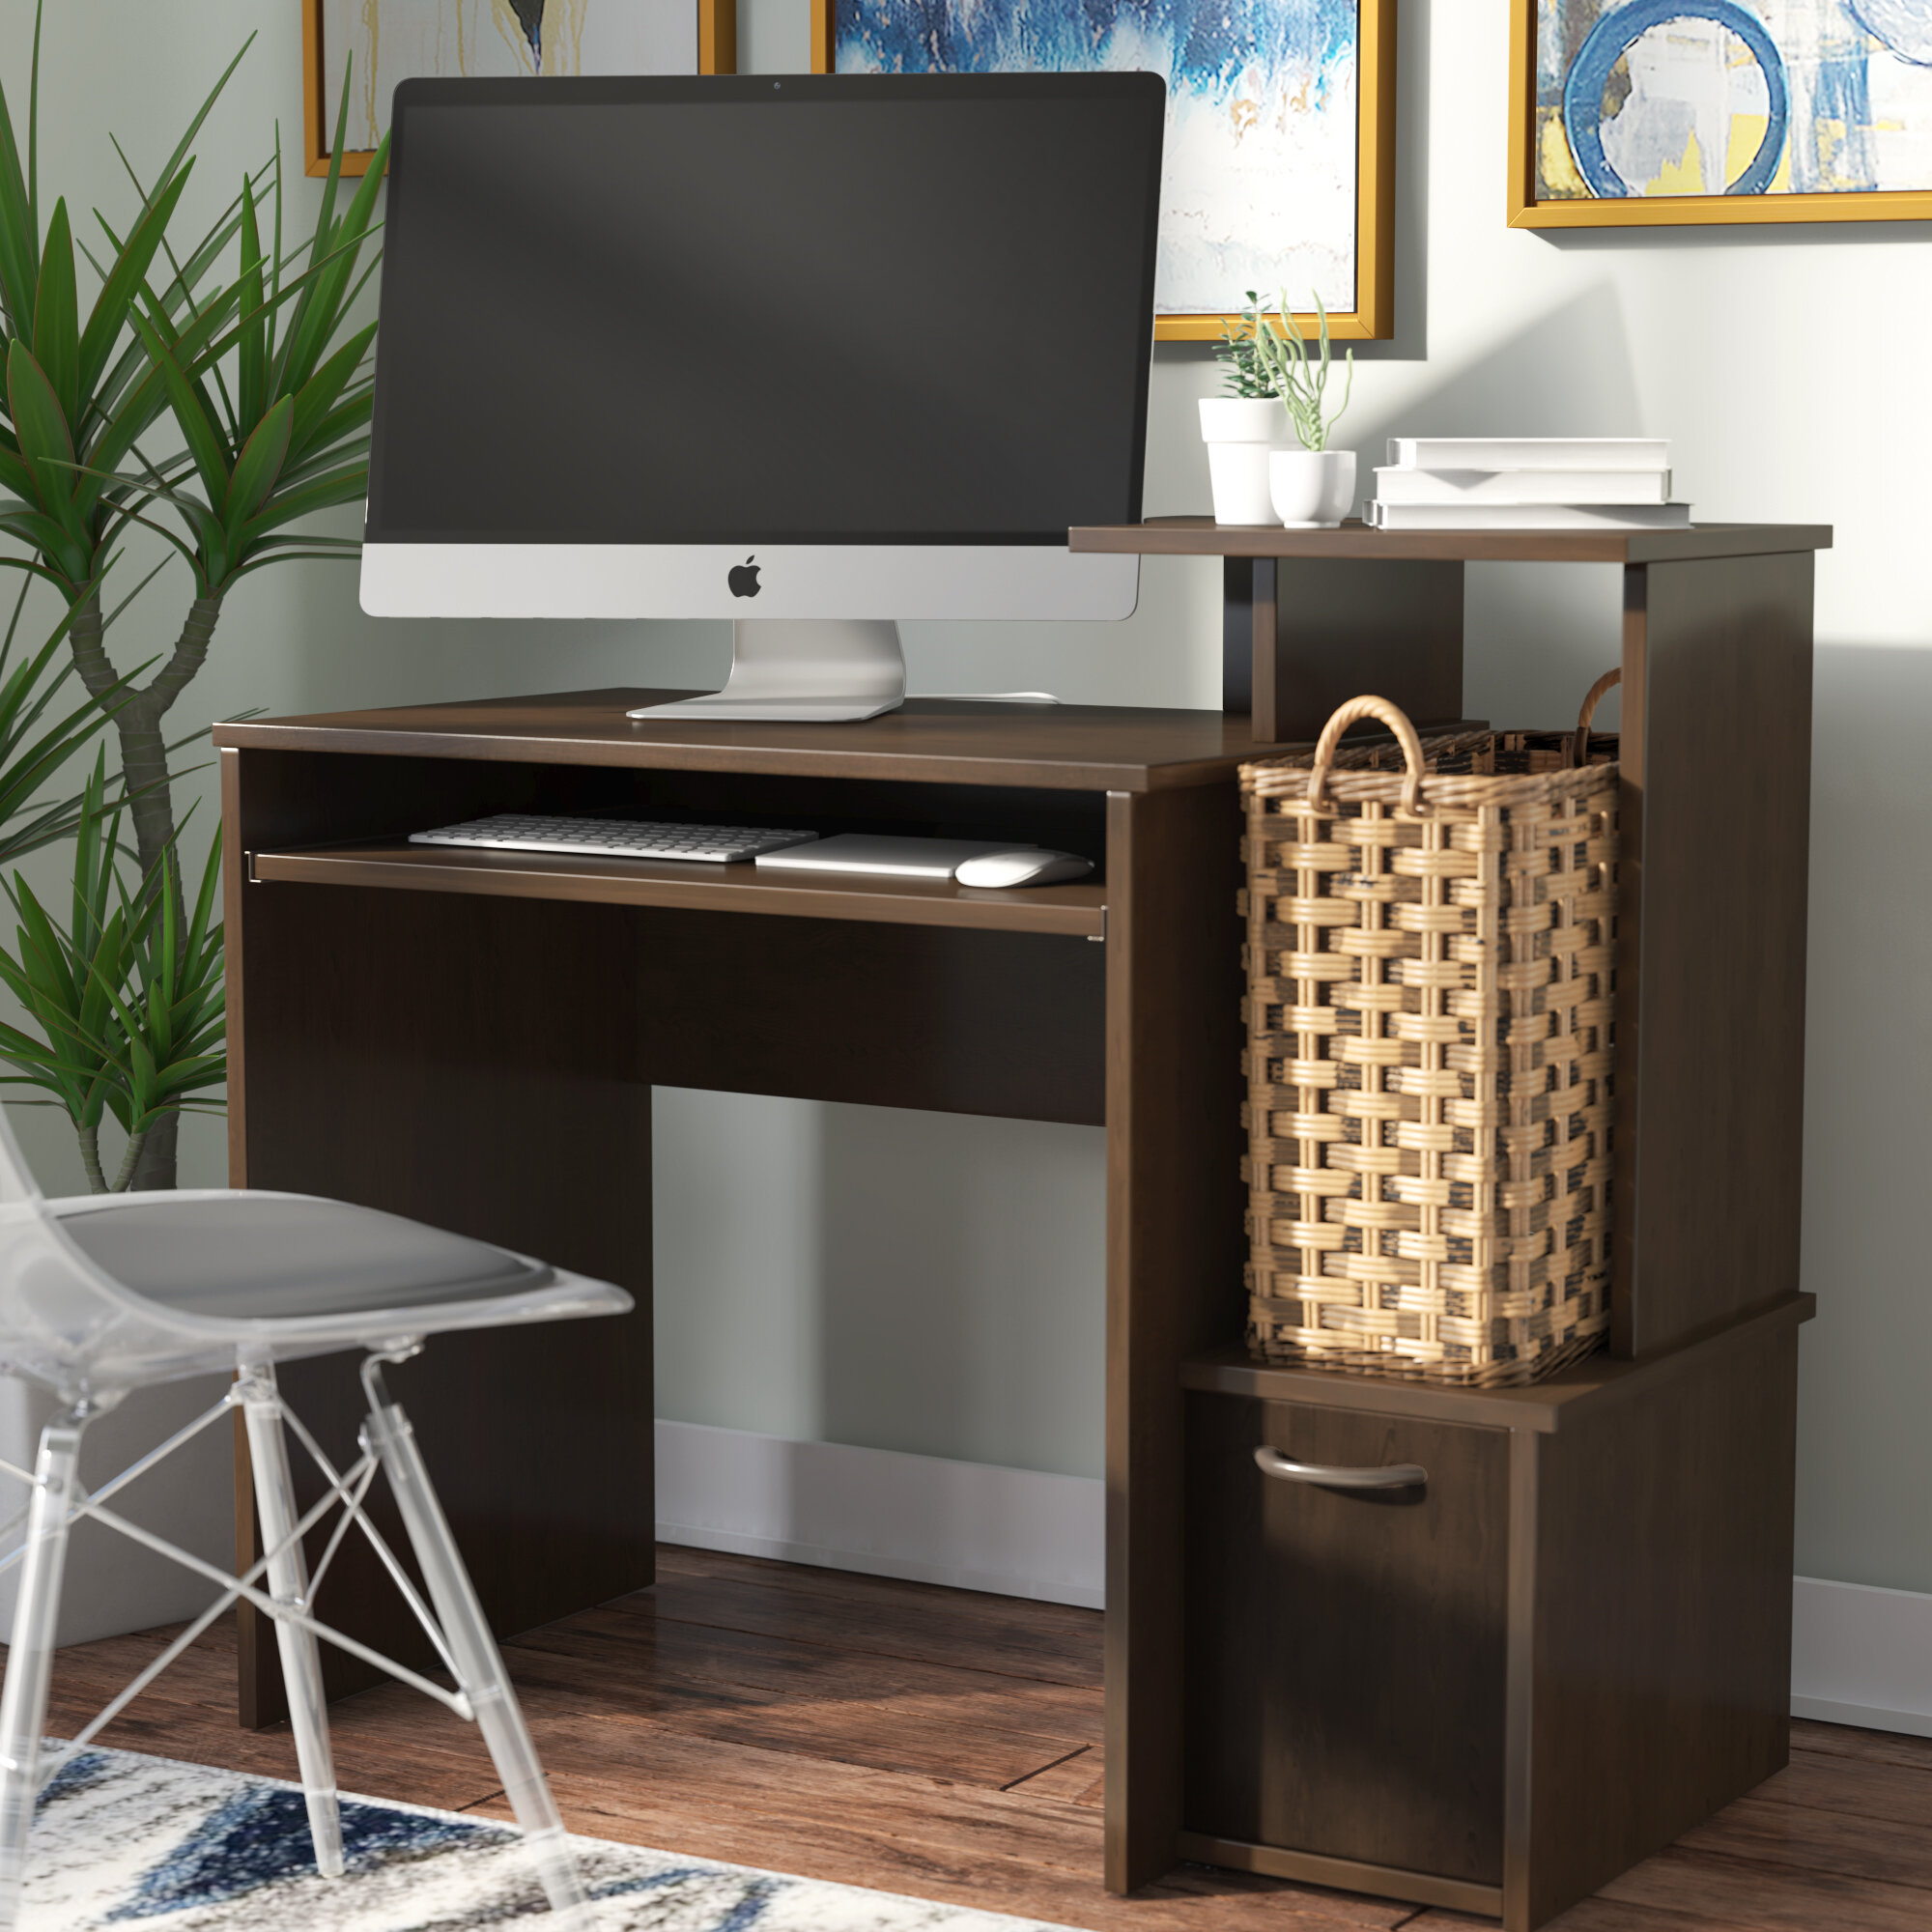 Surprising Axess Computer Desk Wayfair Ca Complete Home Design Collection Papxelindsey Bellcom